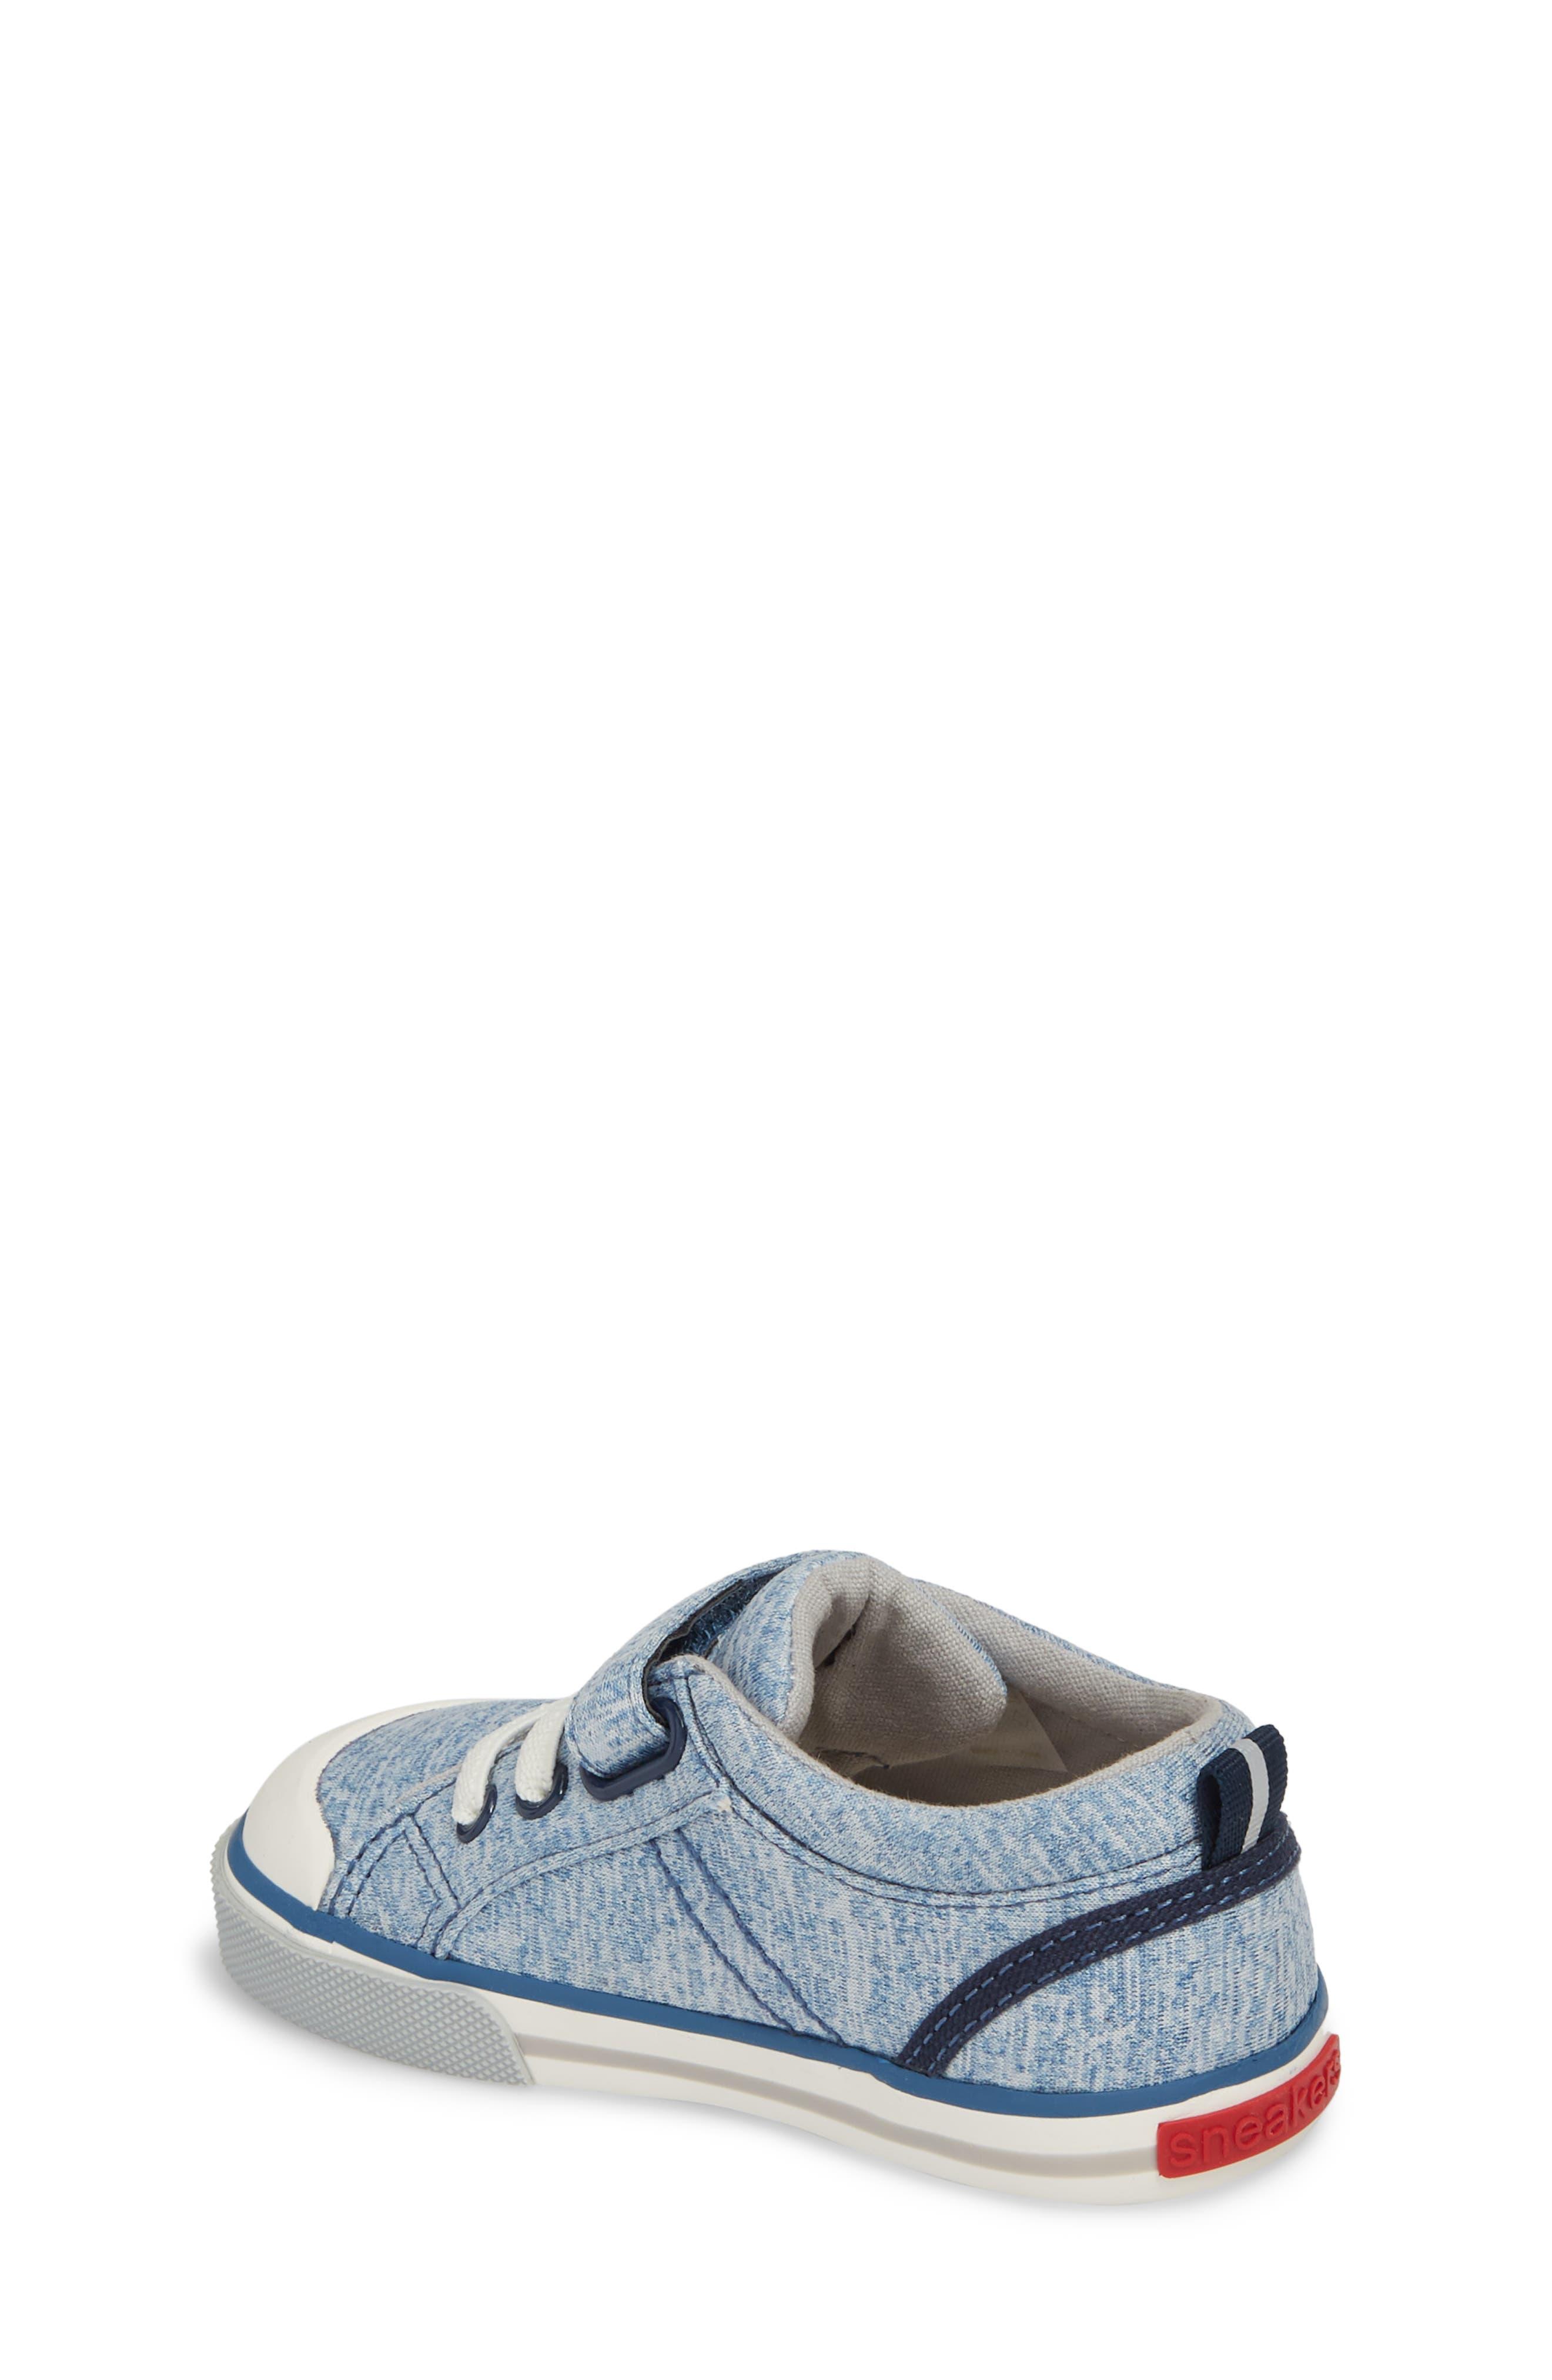 Tanner Sneaker,                             Alternate thumbnail 2, color,                             Blue Jersey